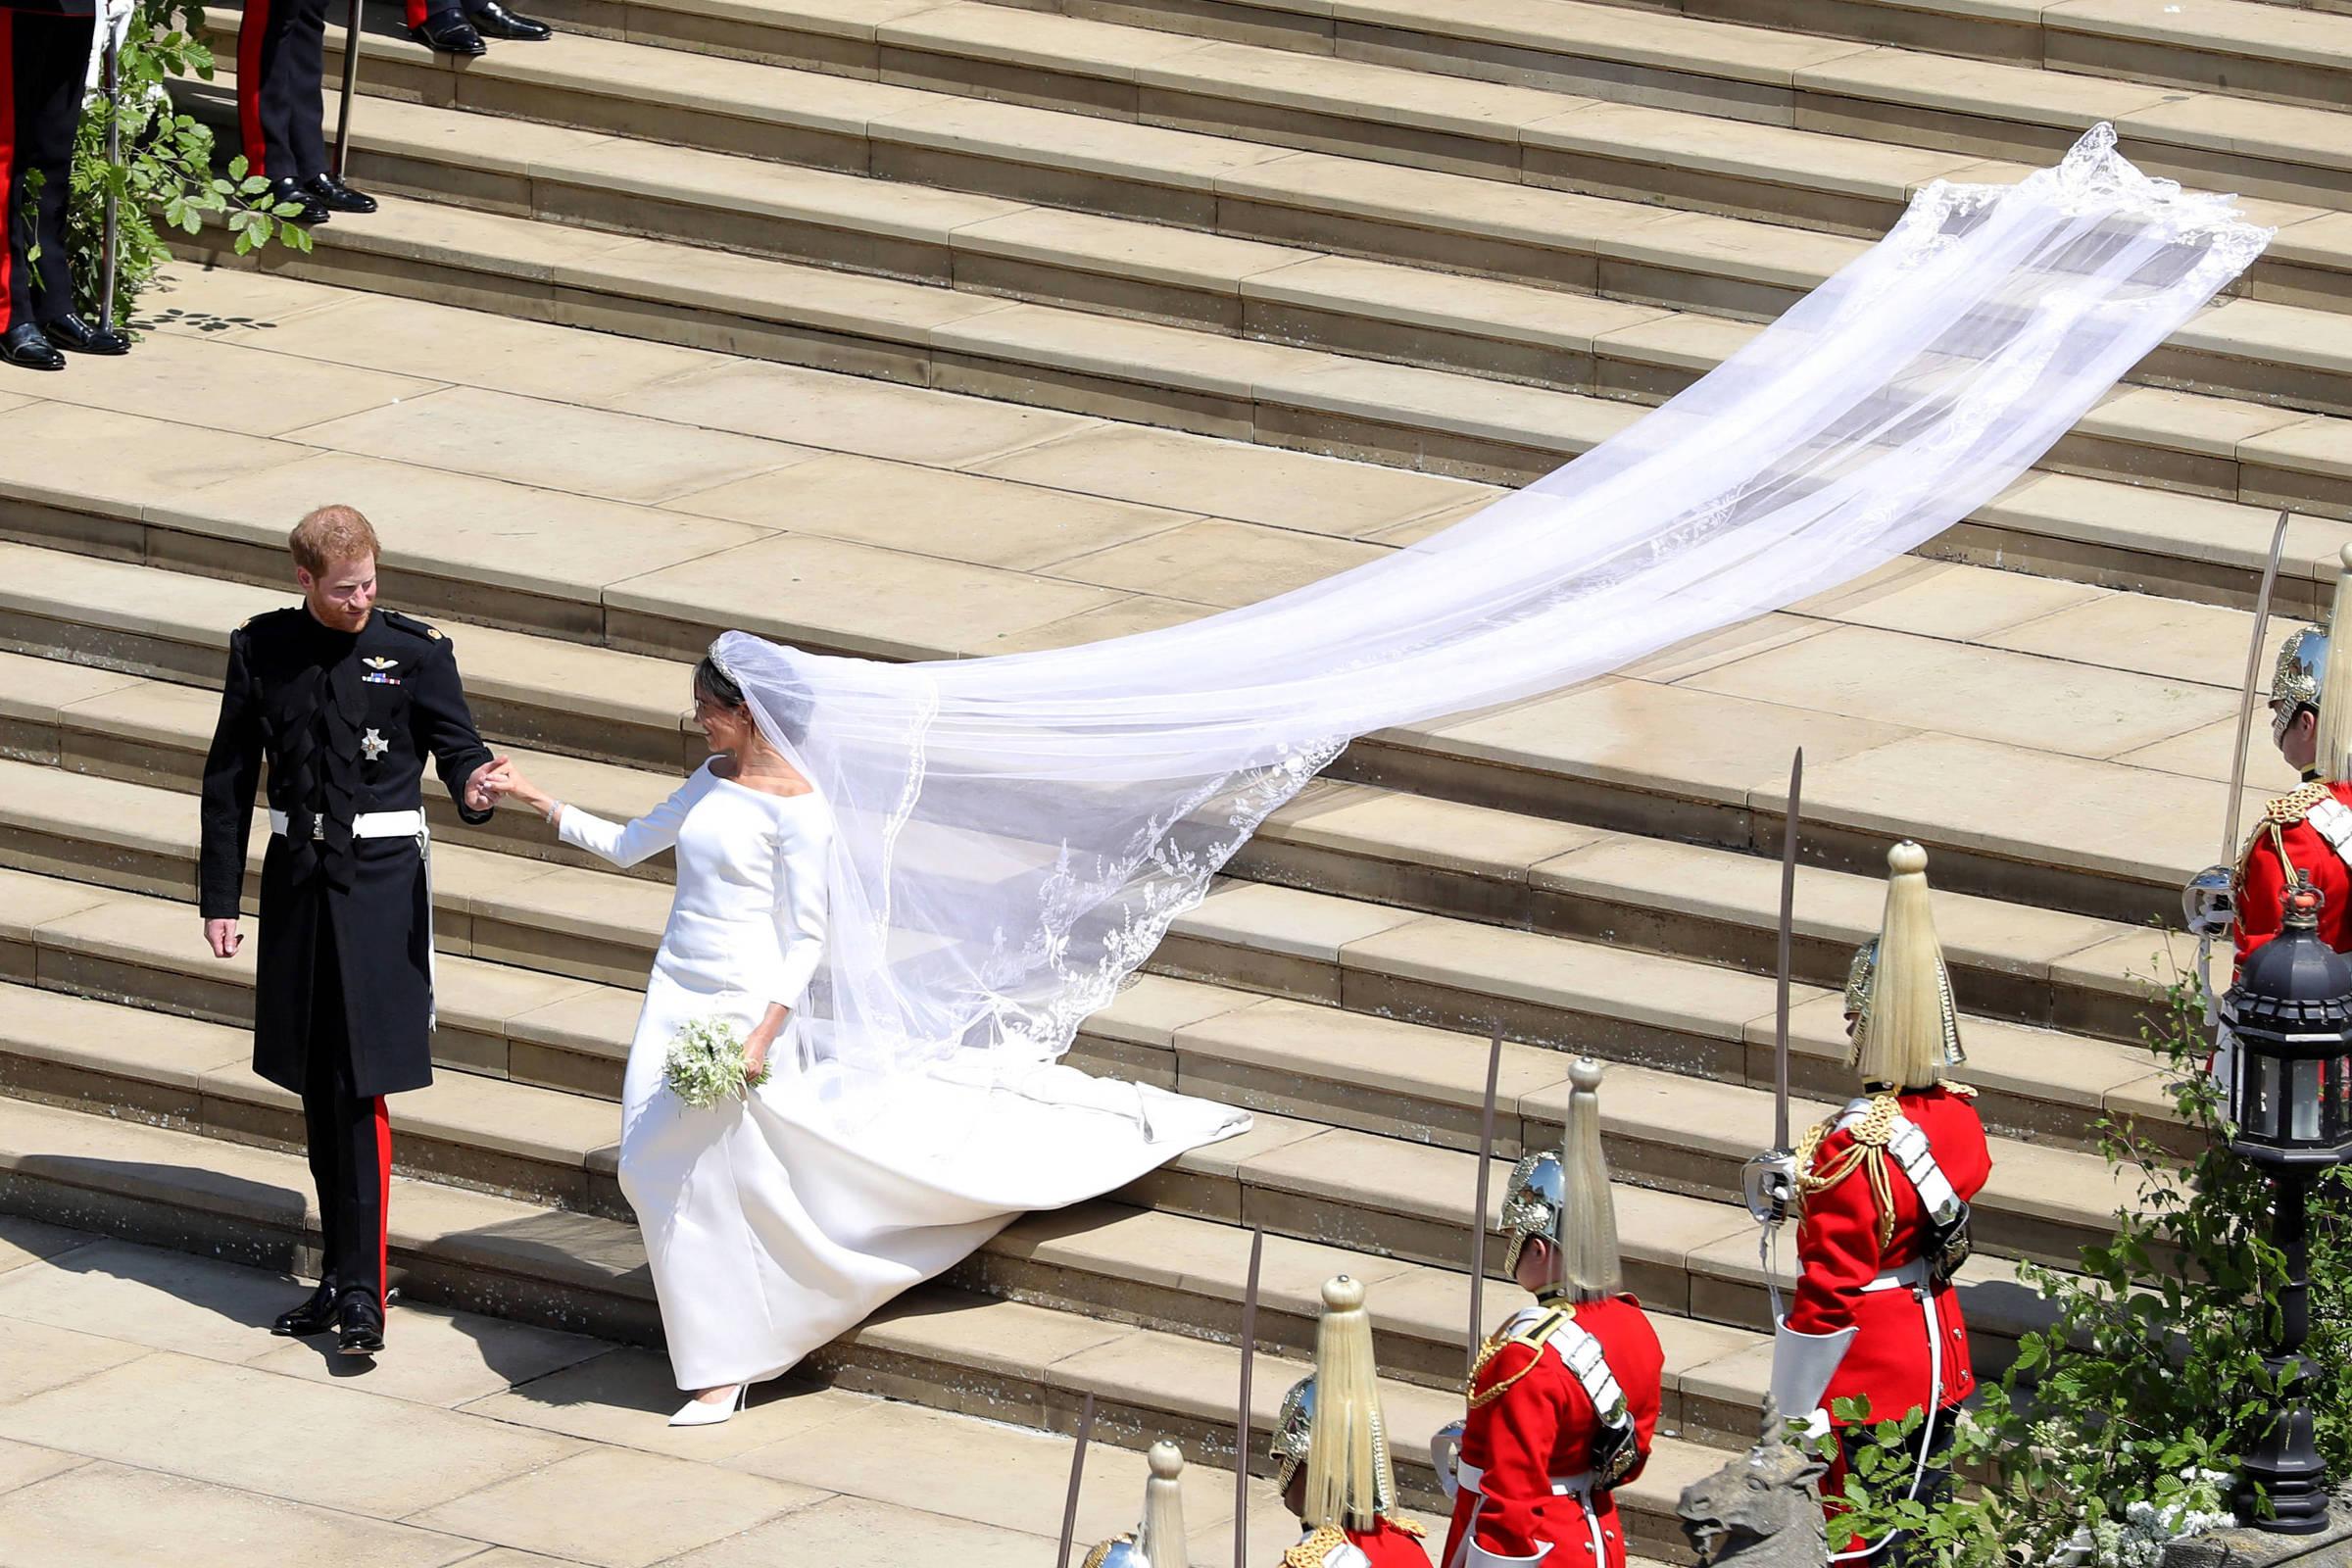 f5 celebridades do bolo ao vestido saiba as diferencas entre os casamentos de meghan kate e diana 19 05 2018 casamentos de meghan kate e diana